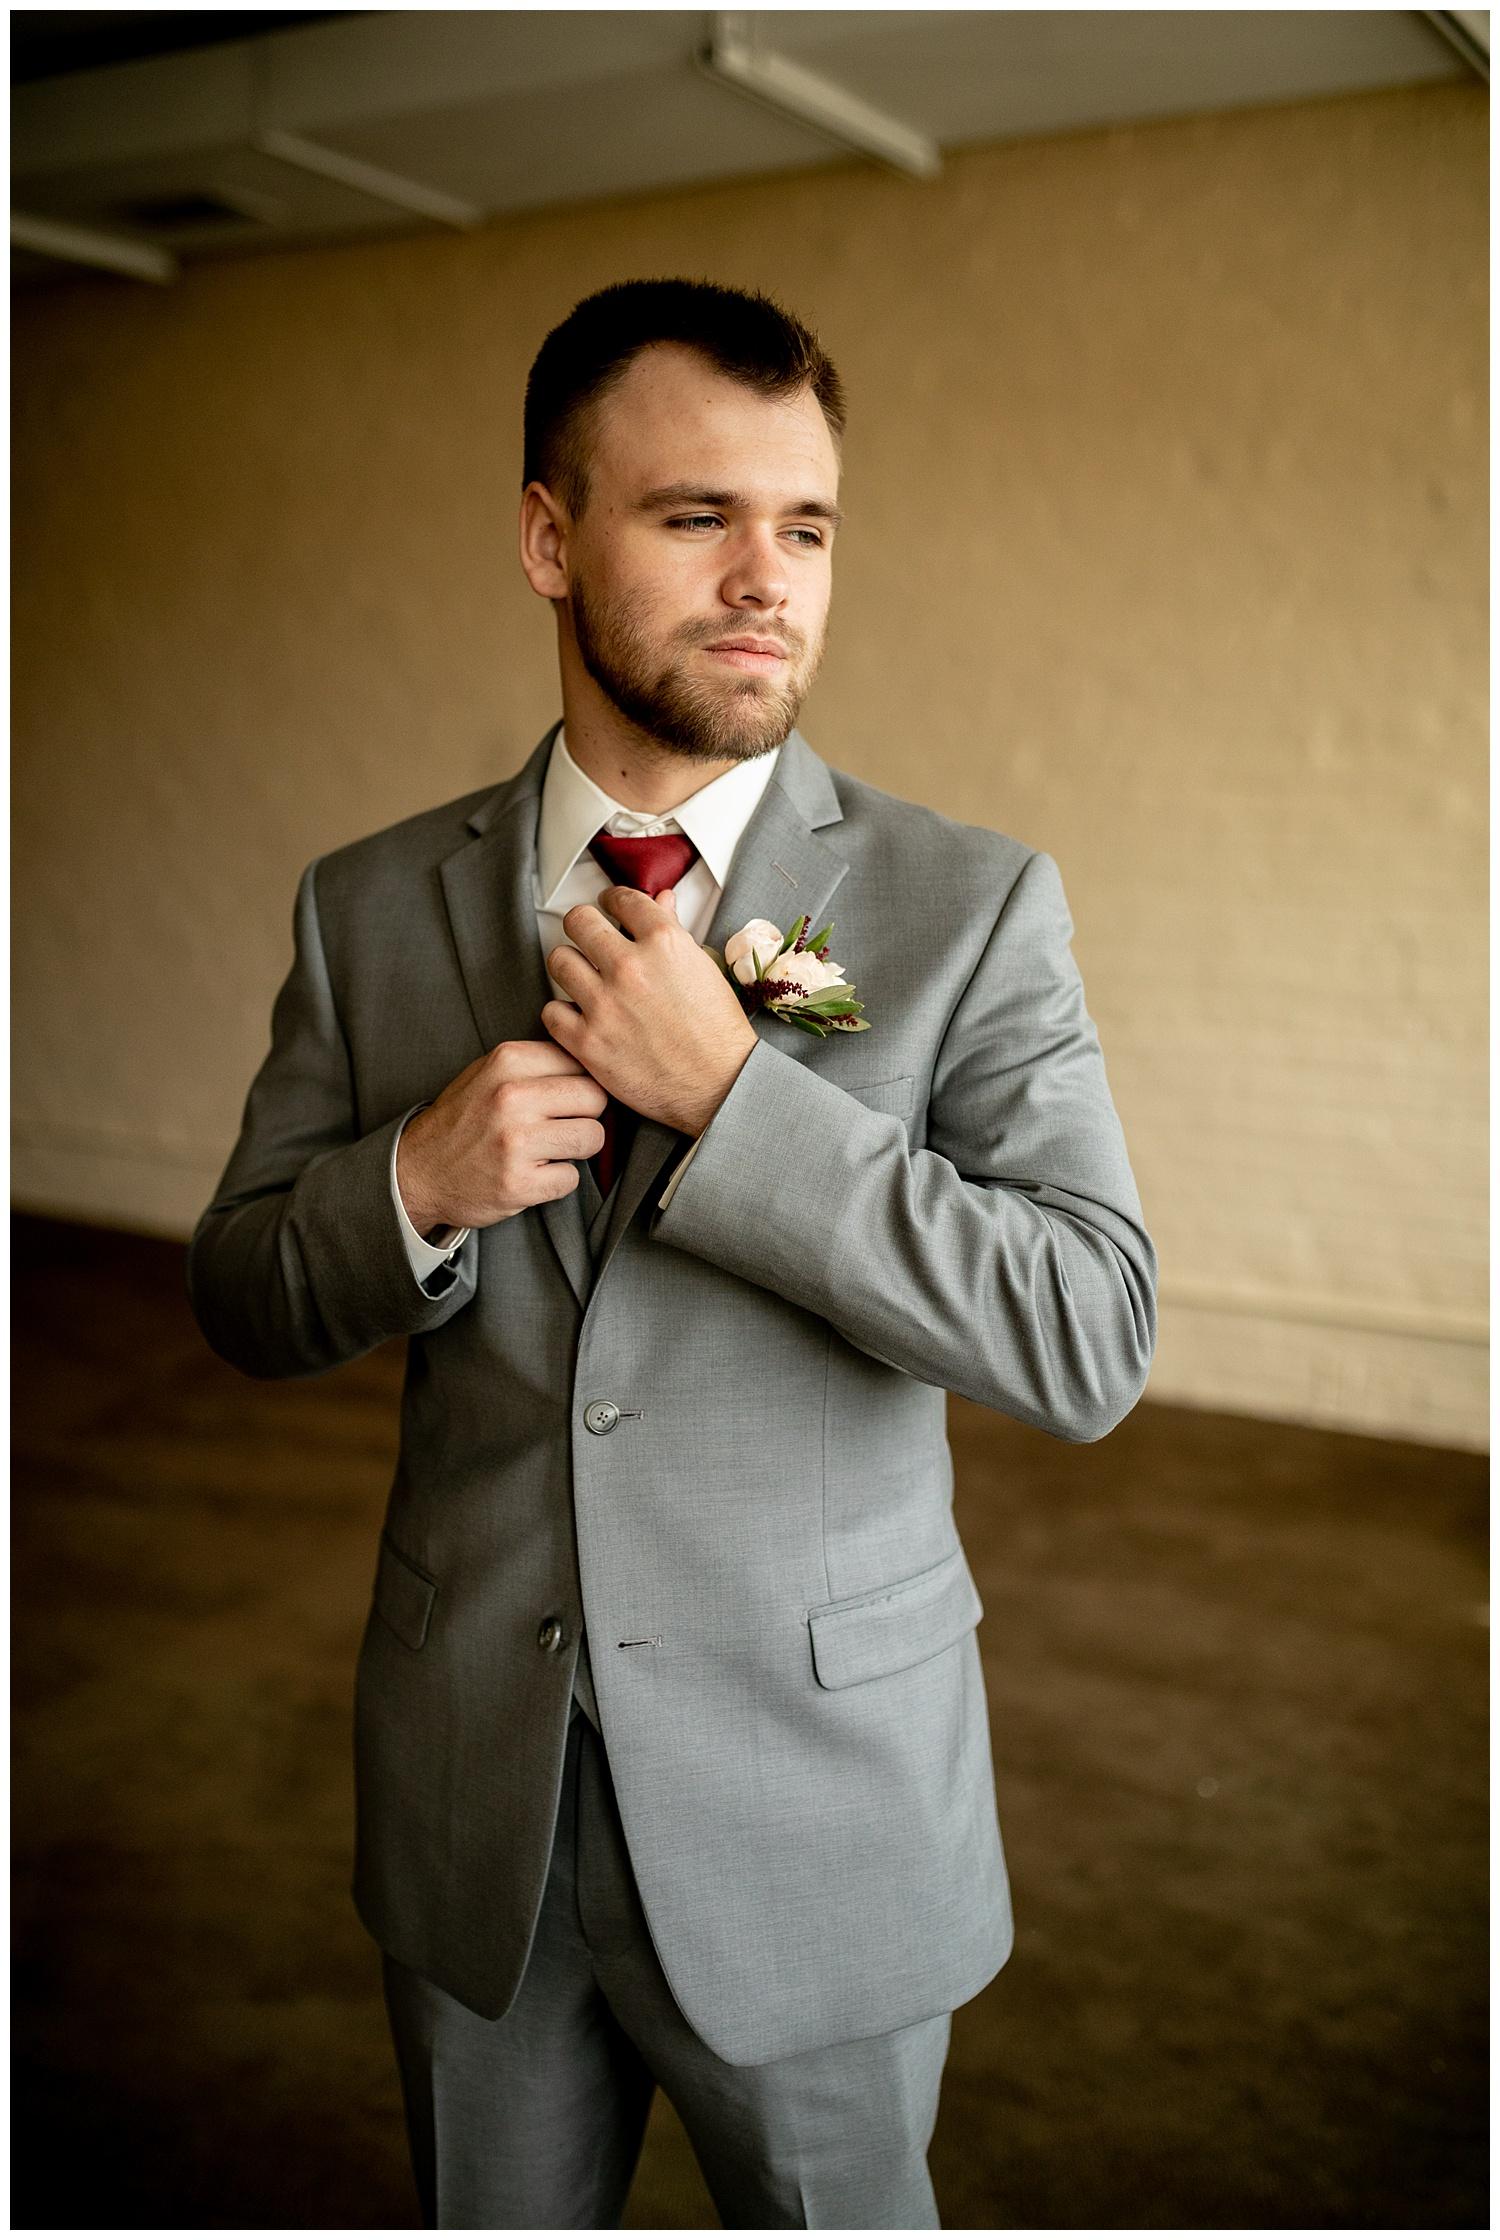 TheSmythCollective-Best-Cincinnati-Wedding-Photographer-Urban-Downtown-Covington-Wedding-05.jpg